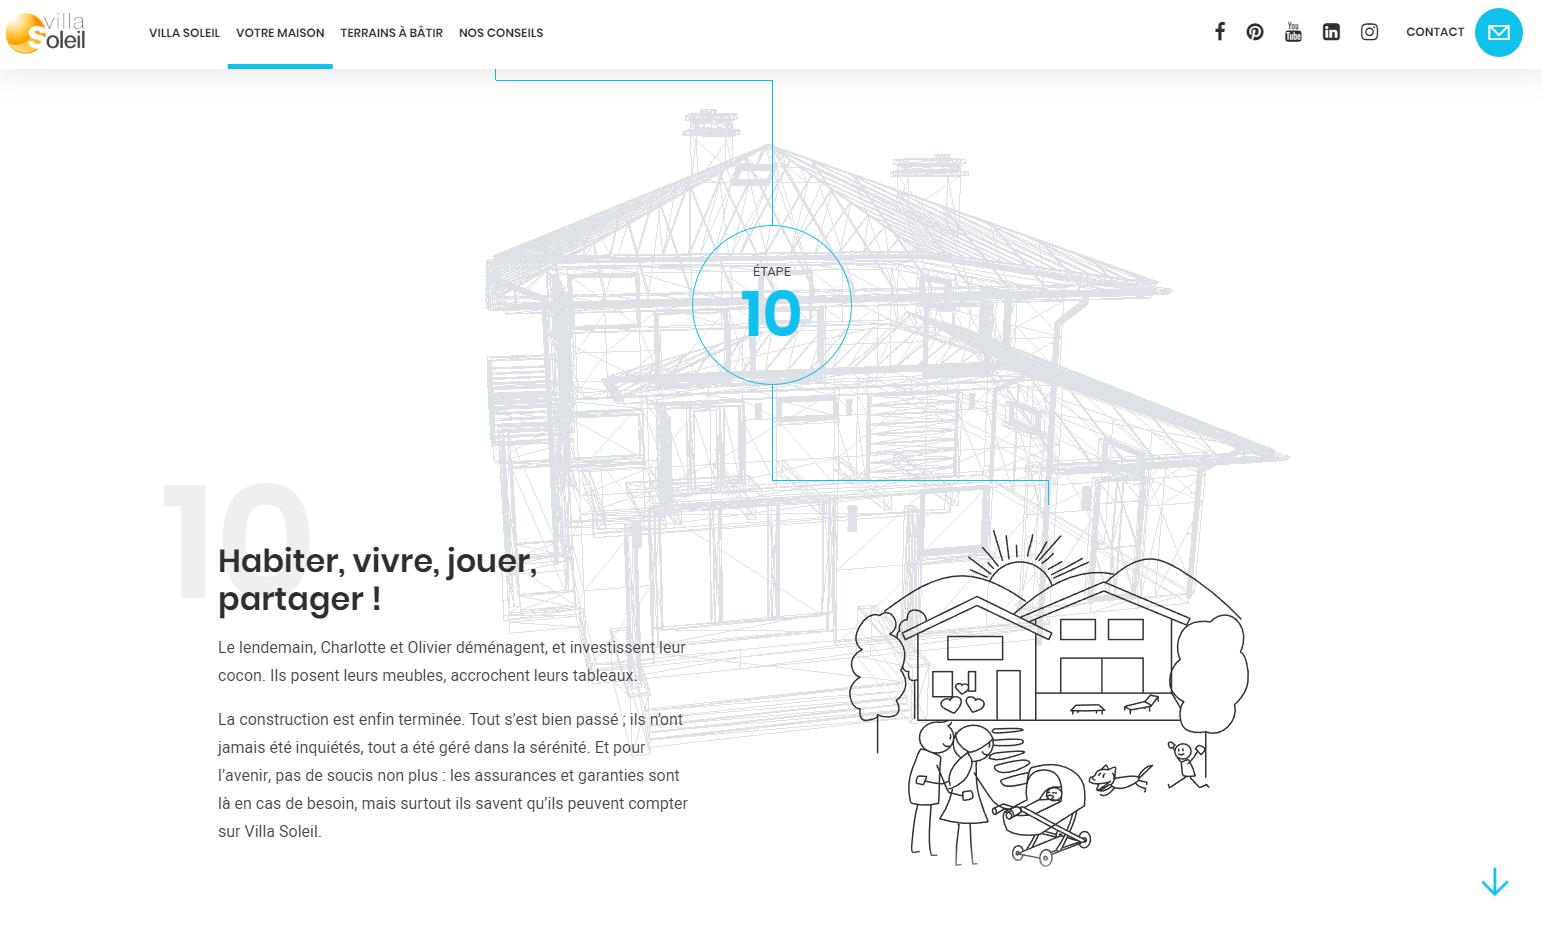 storytelling du site villa soleil